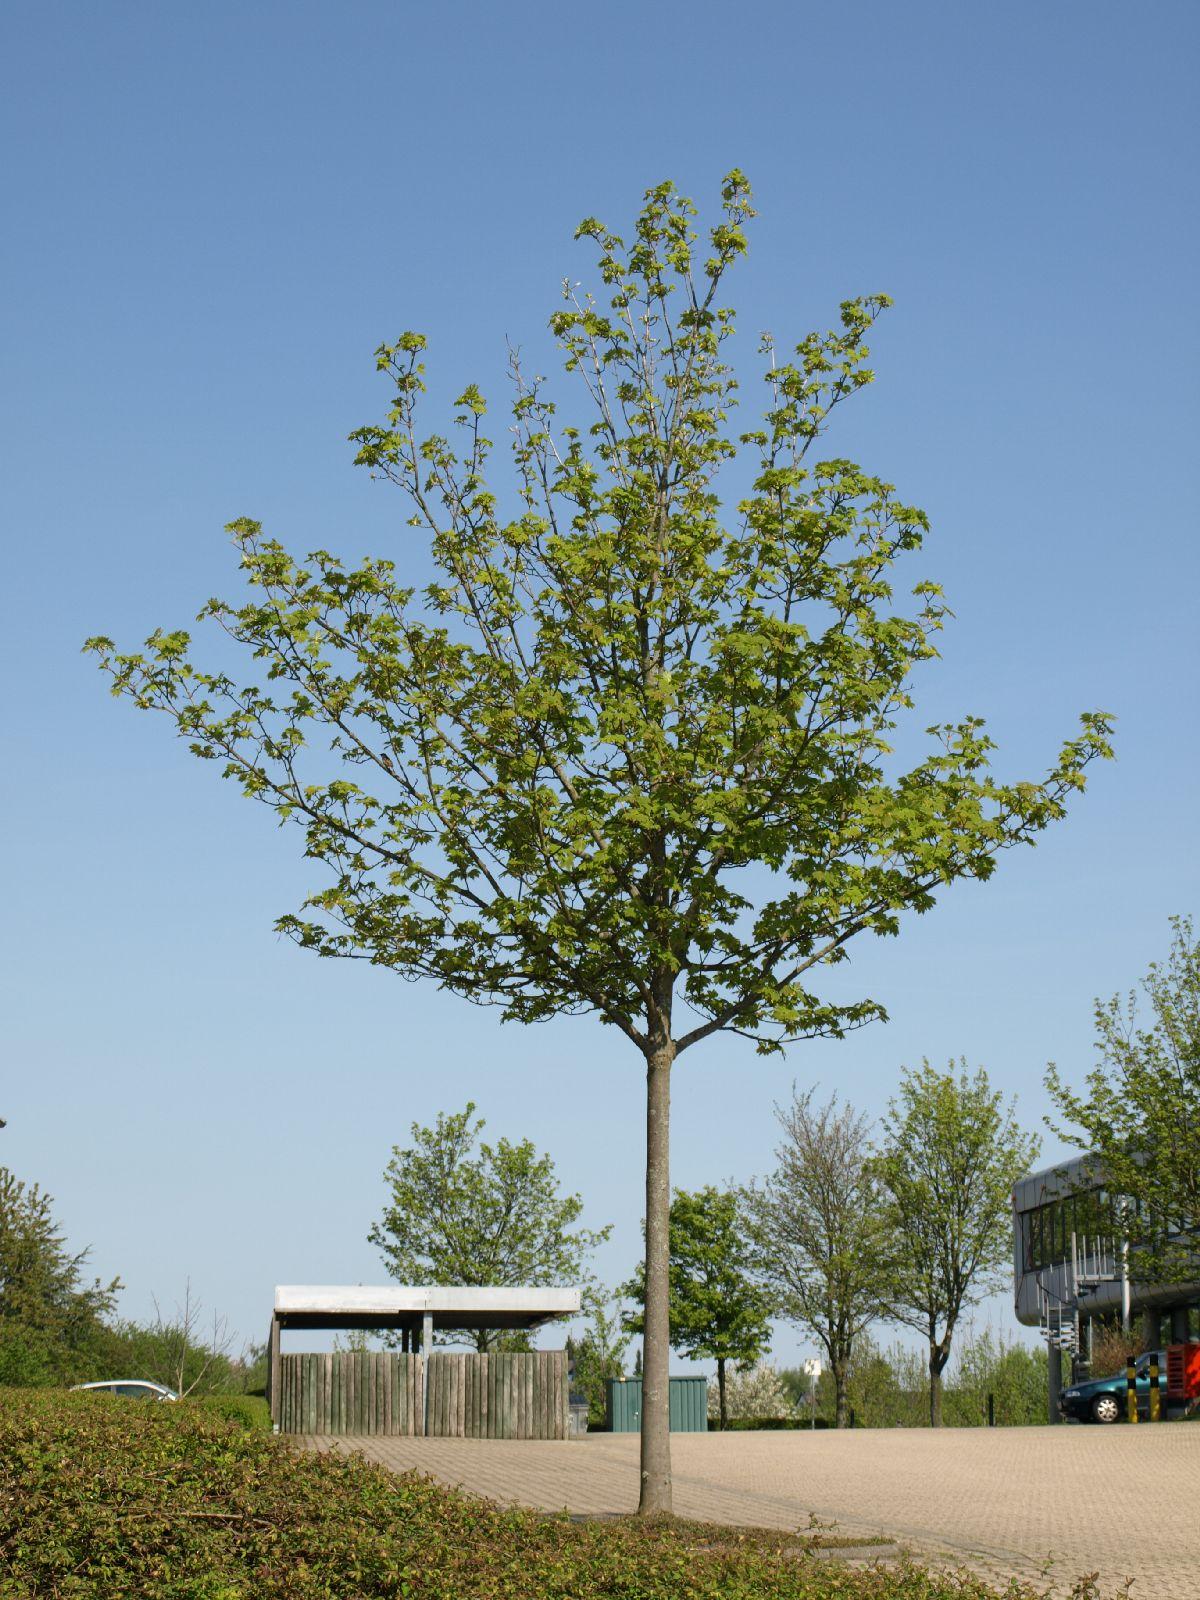 Plants-Trees_Photo_Texture_B_P5042446